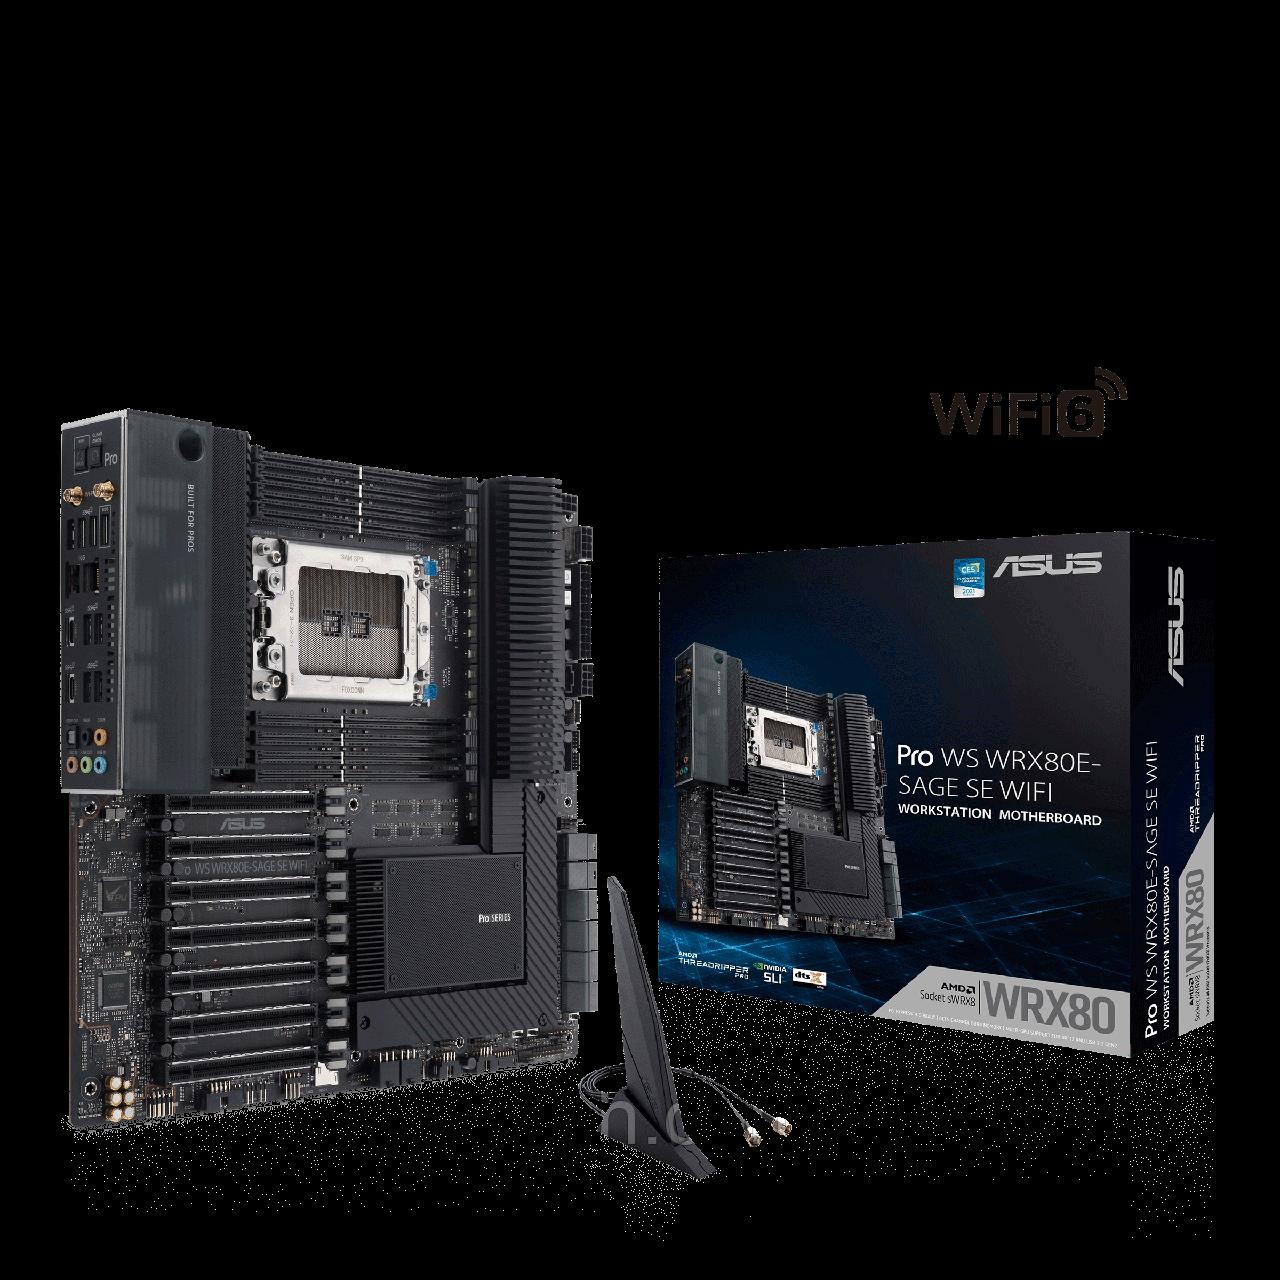 PRO WS WRX80E-SAGE SE WIFI ASUS